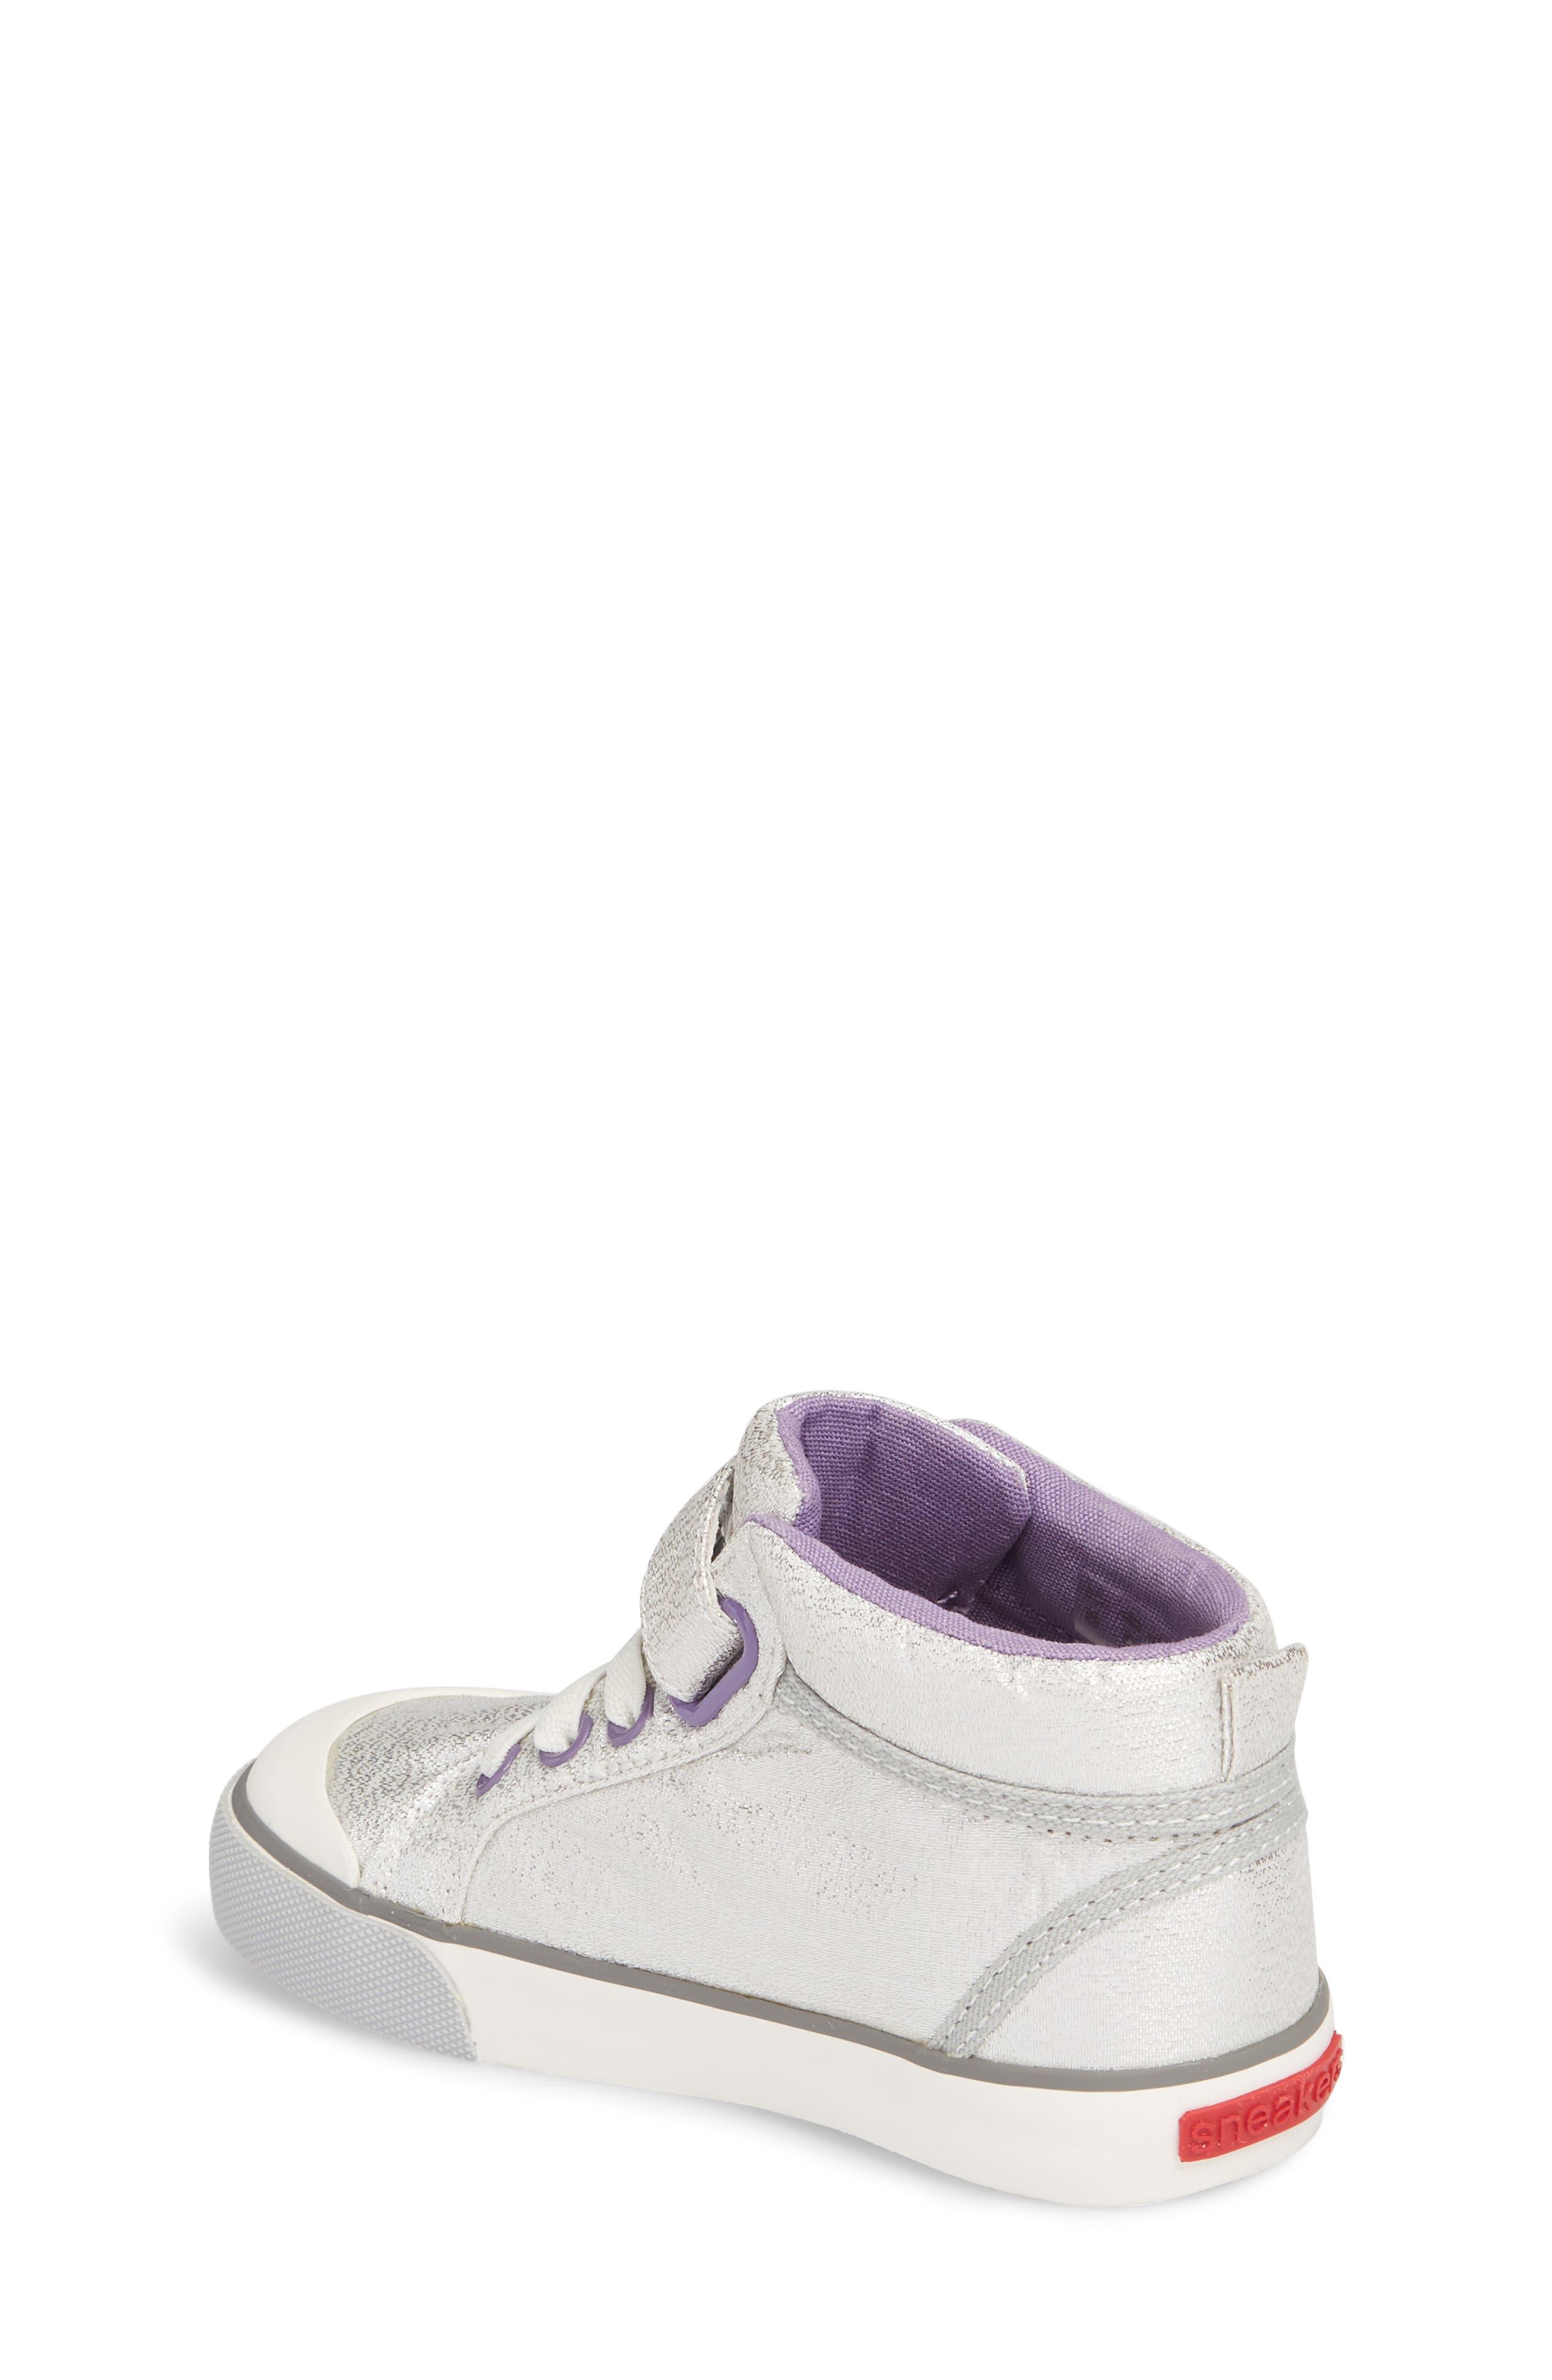 Peyton Metallic Mid Top Sneaker,                             Alternate thumbnail 2, color,                             SILVER GLITTER